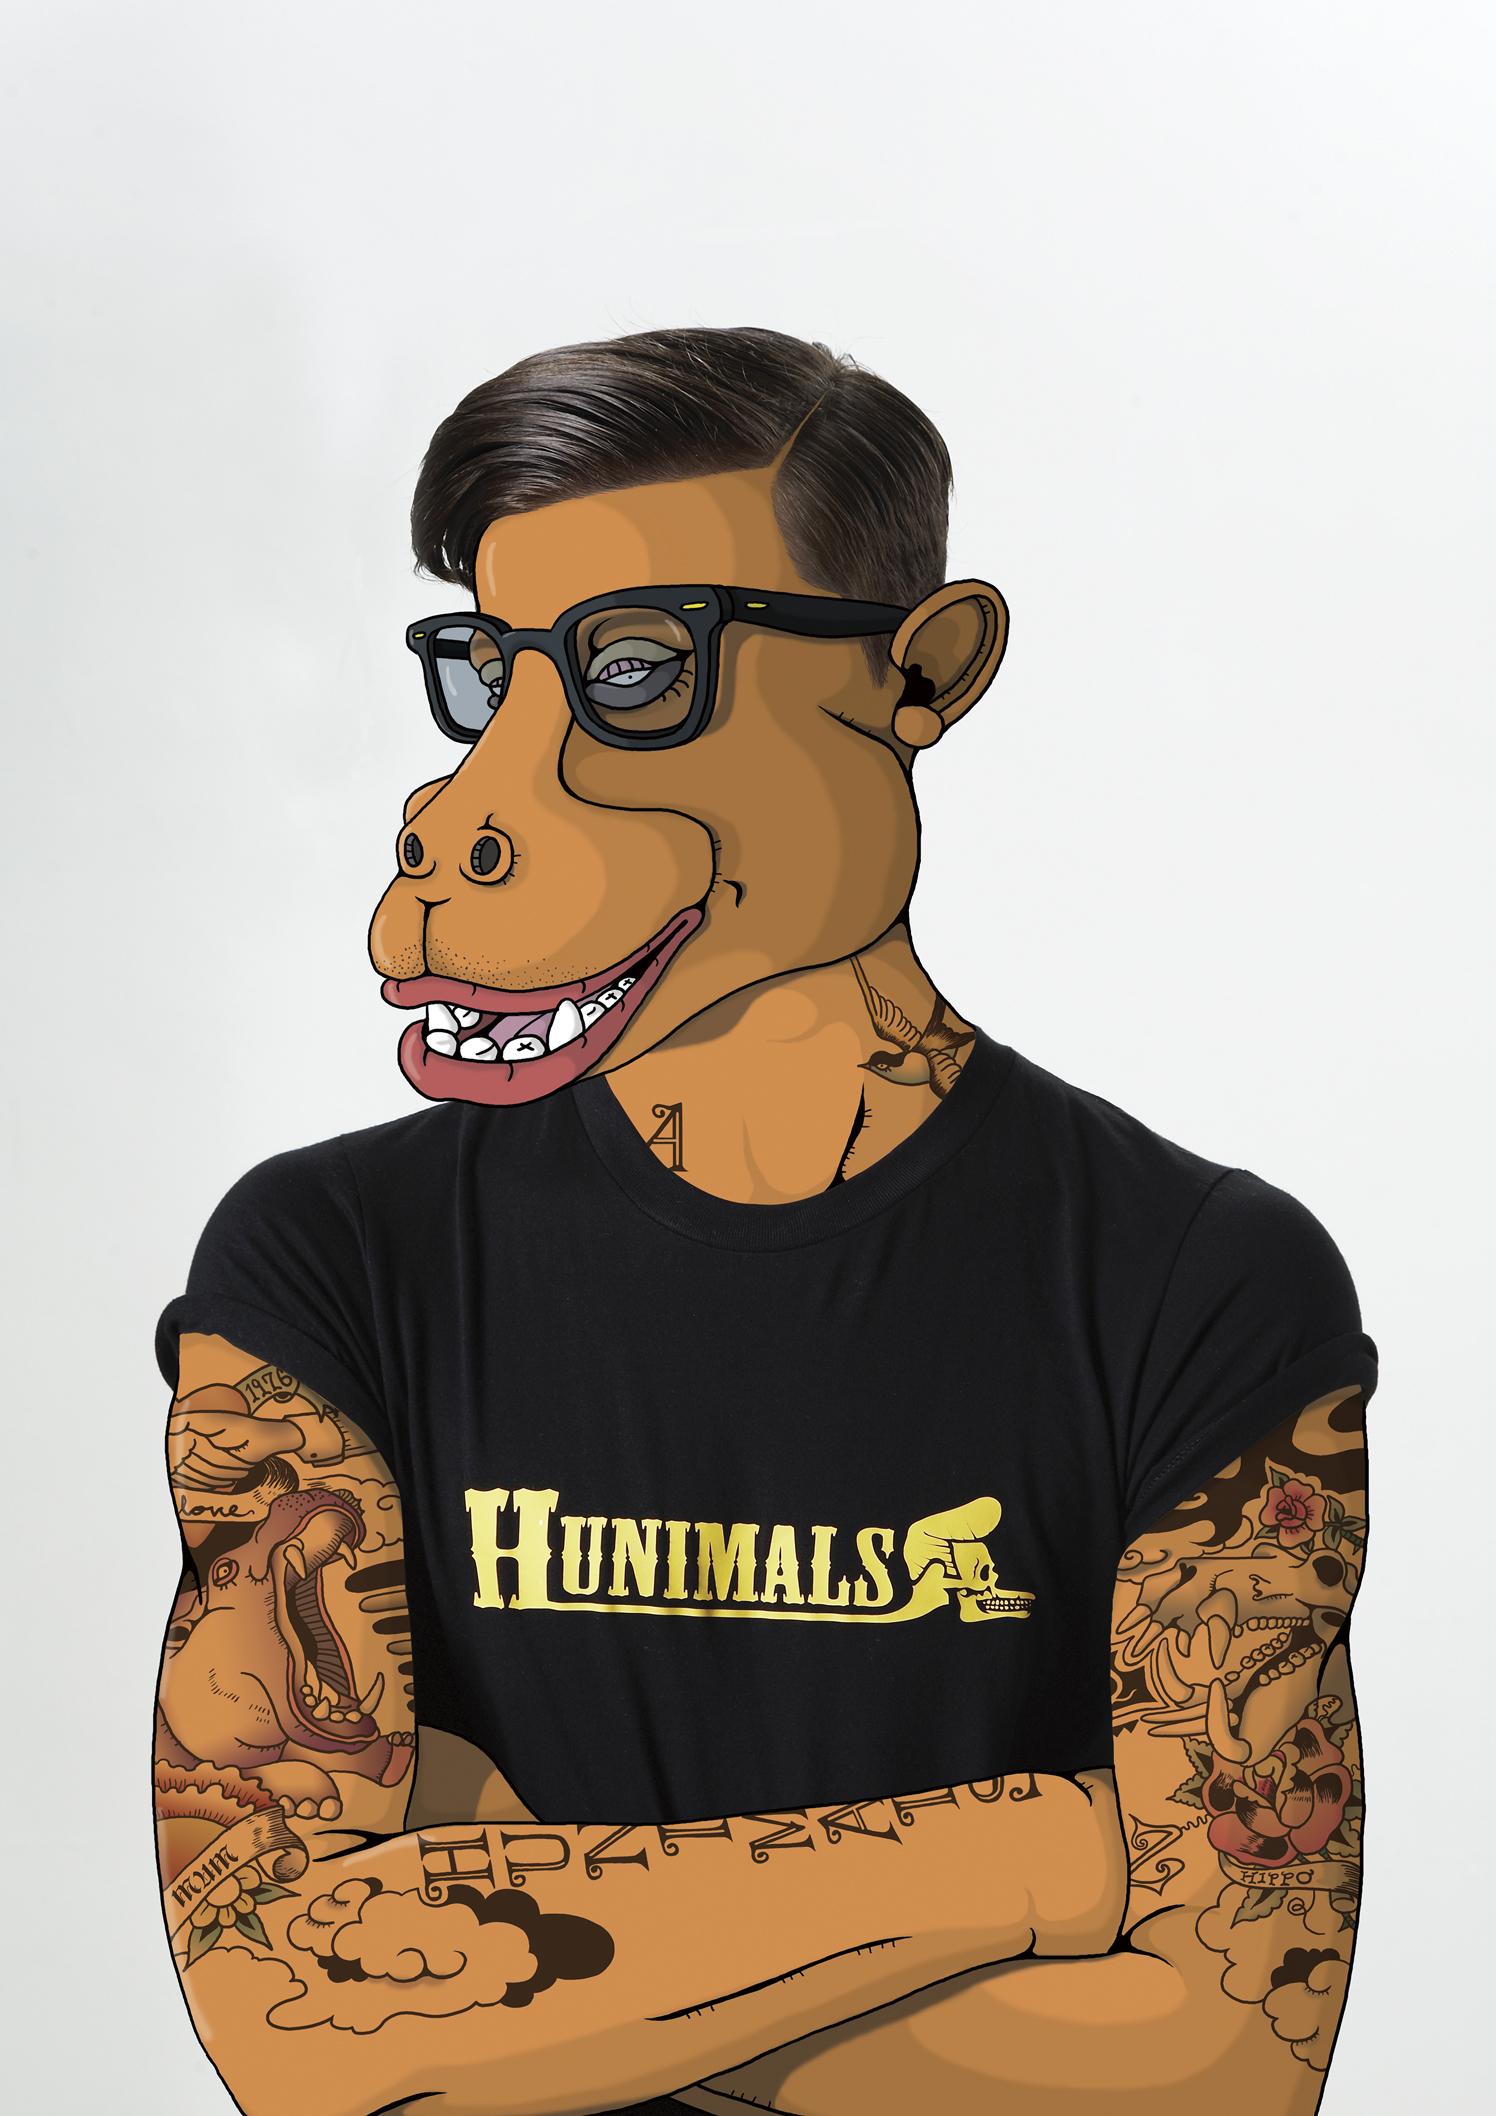 Hunimals Joe